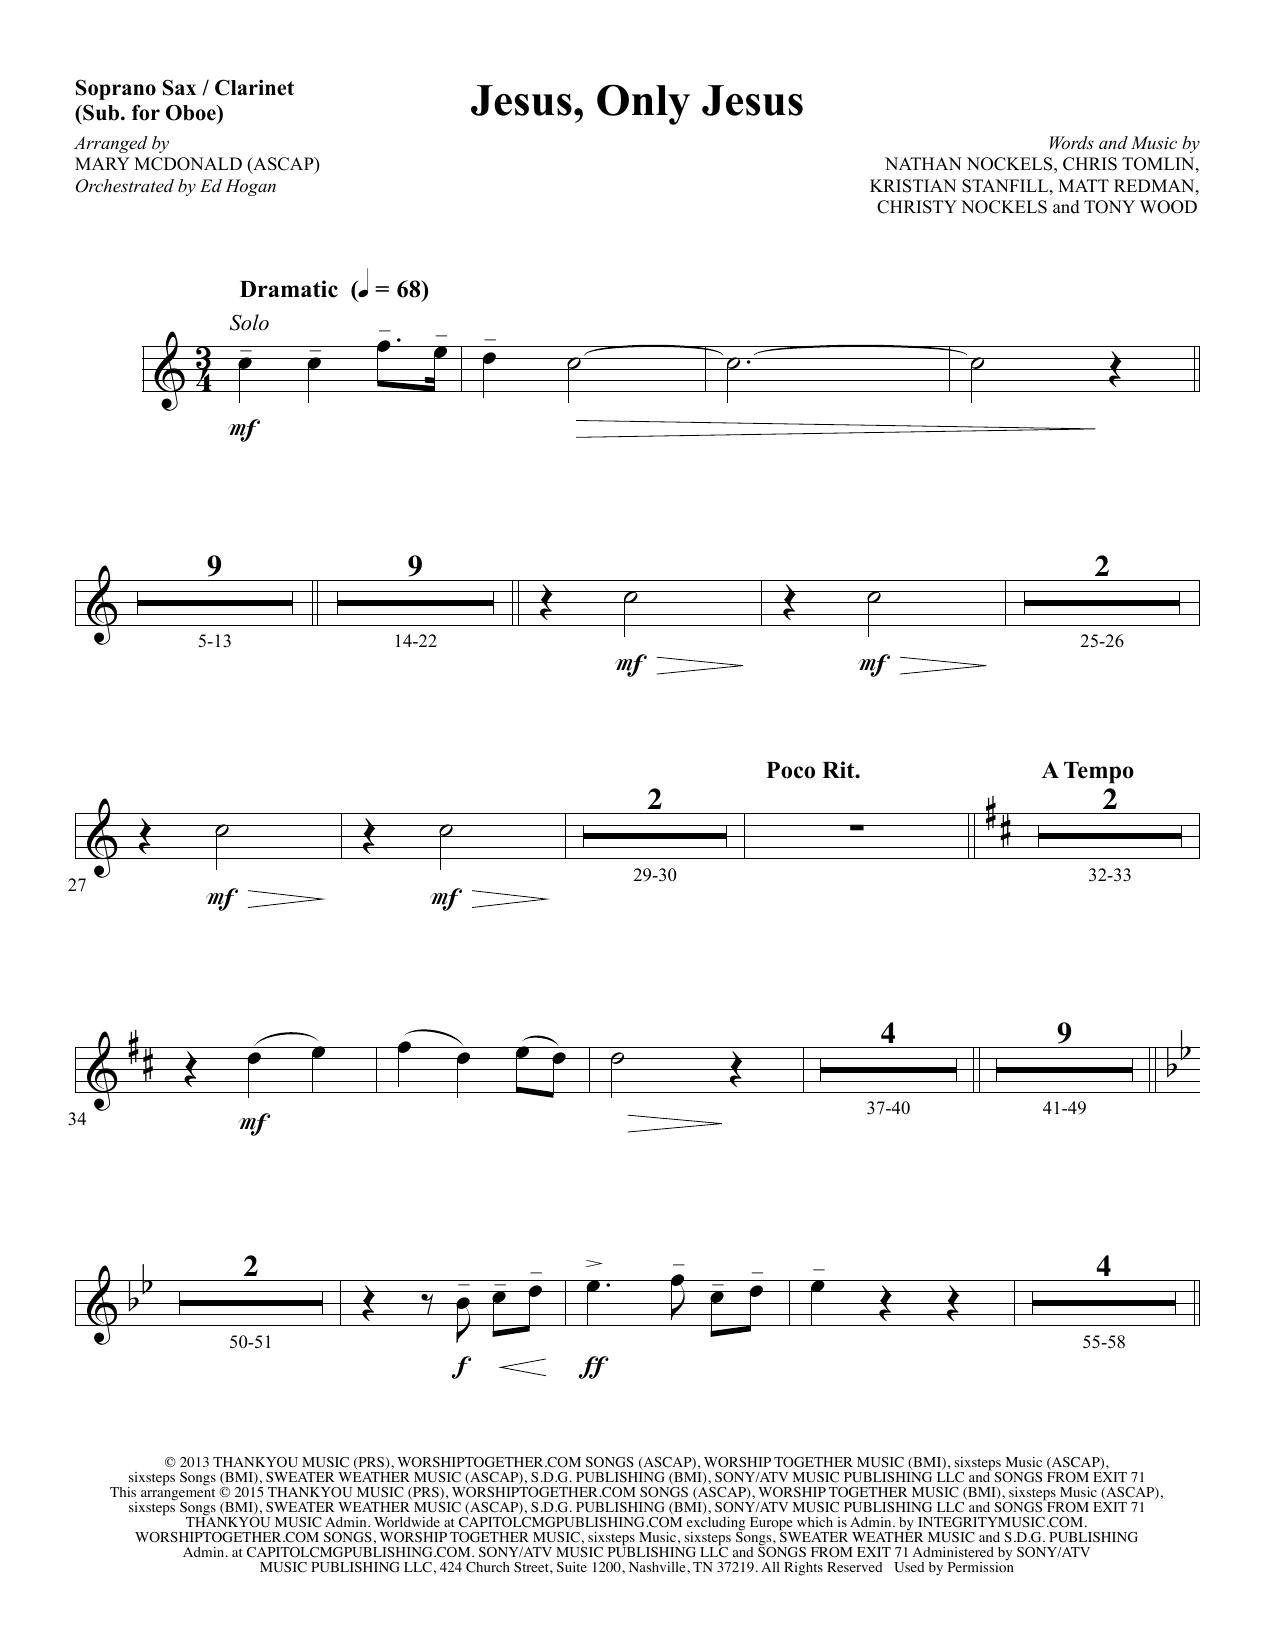 Jesus, Only Jesus - Soprano Sax/Clarinet(sub oboe) sheet music